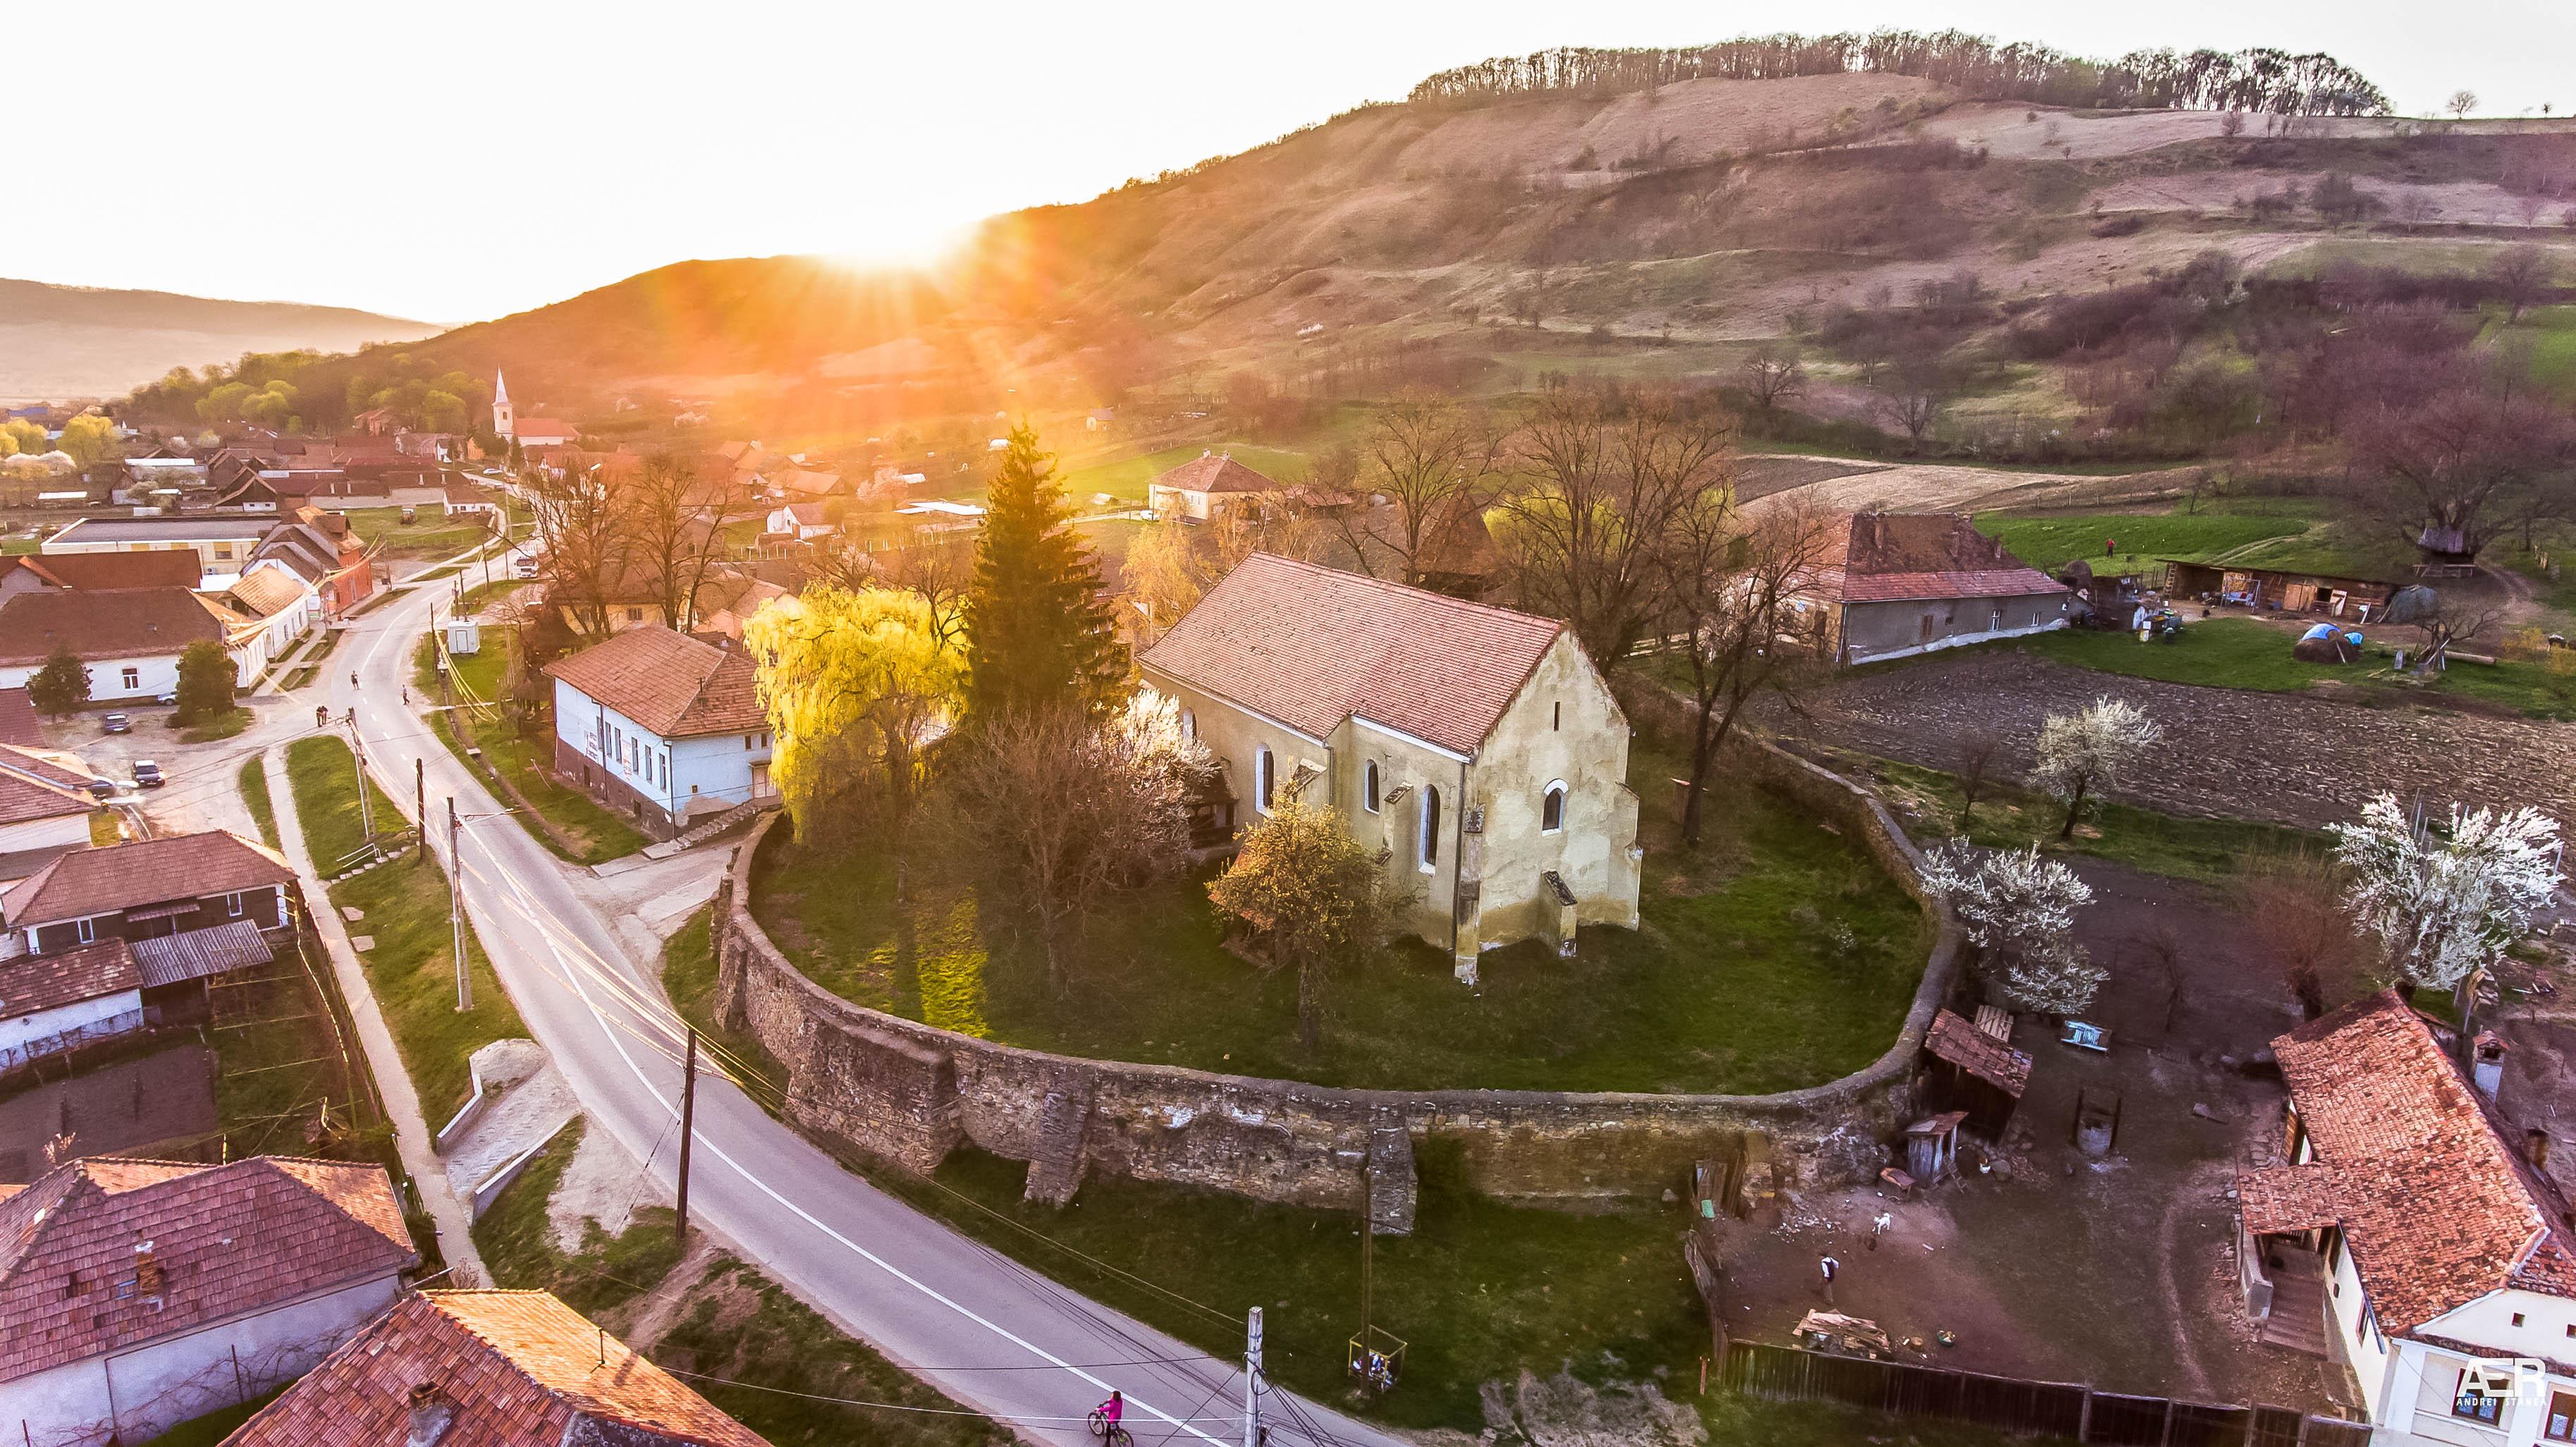 Biserica Evanghelica la început de primăvara